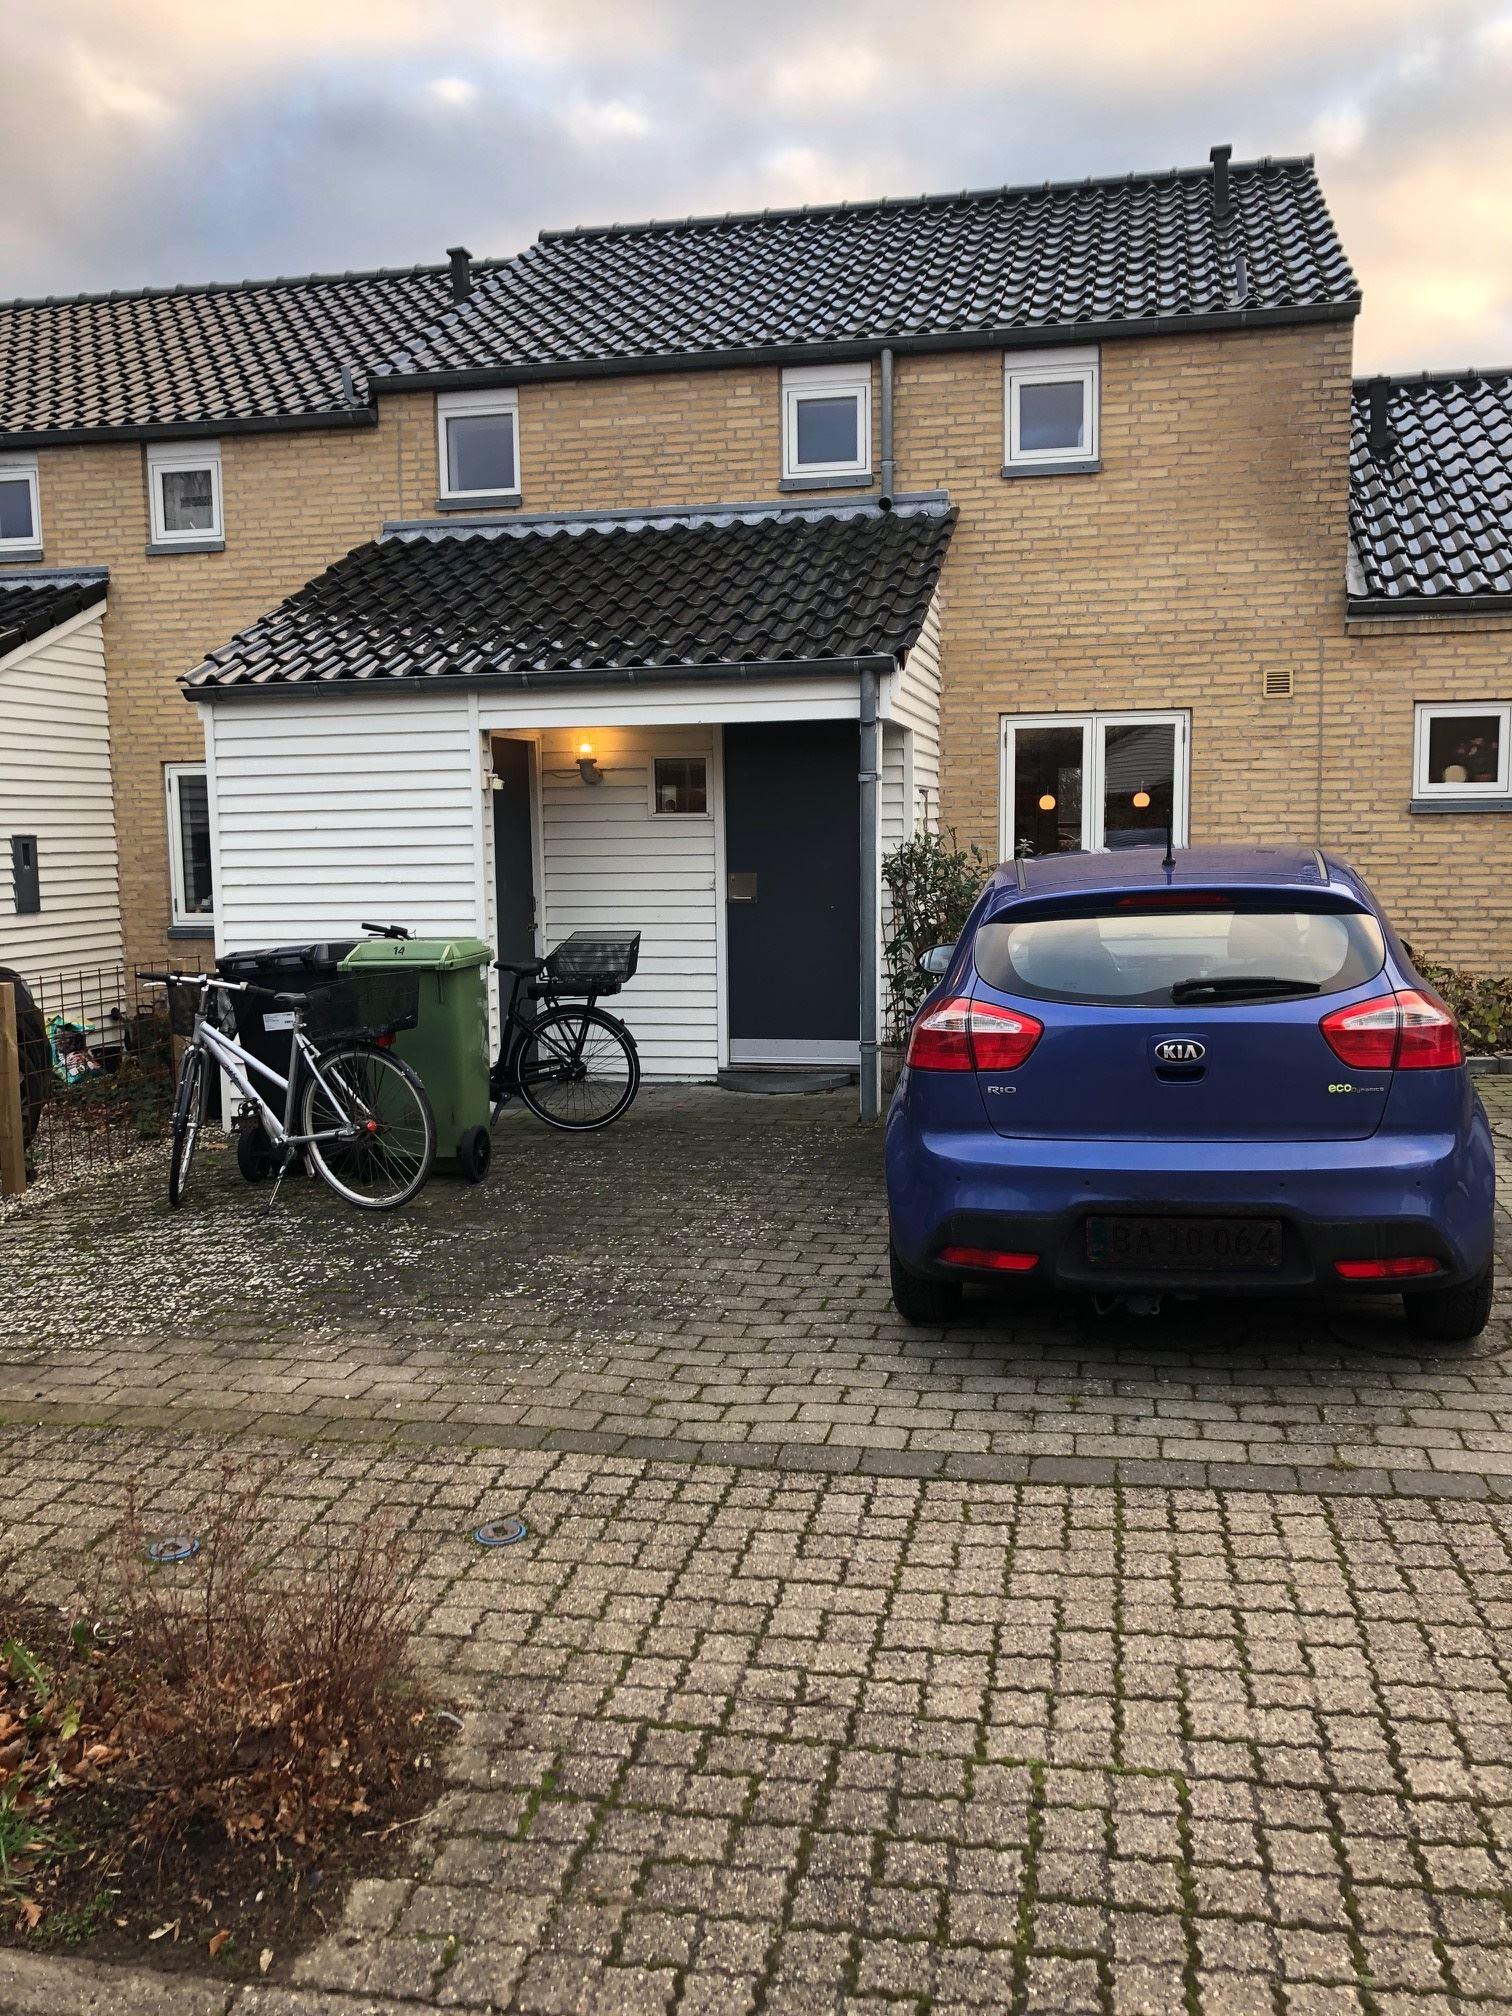 Kildehaven 14, 8520 Lystrup